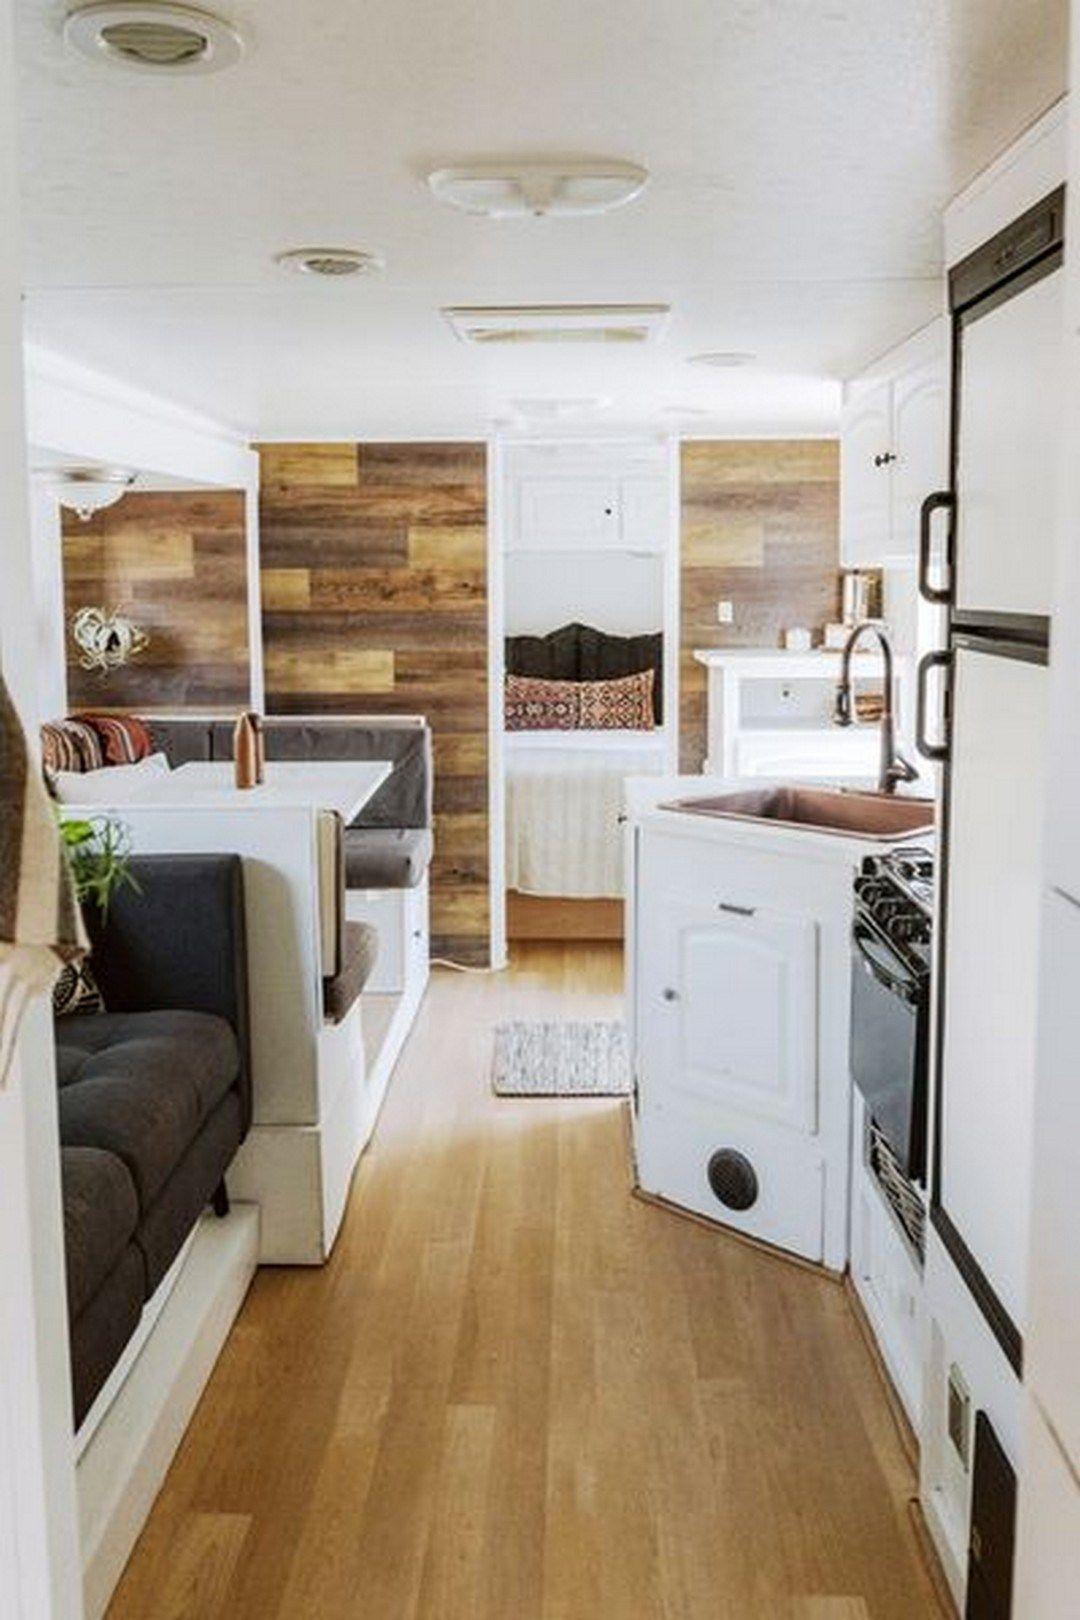 Best Hacks RV Glamping RV Makeover Ideas (39) | Home | Remodeled